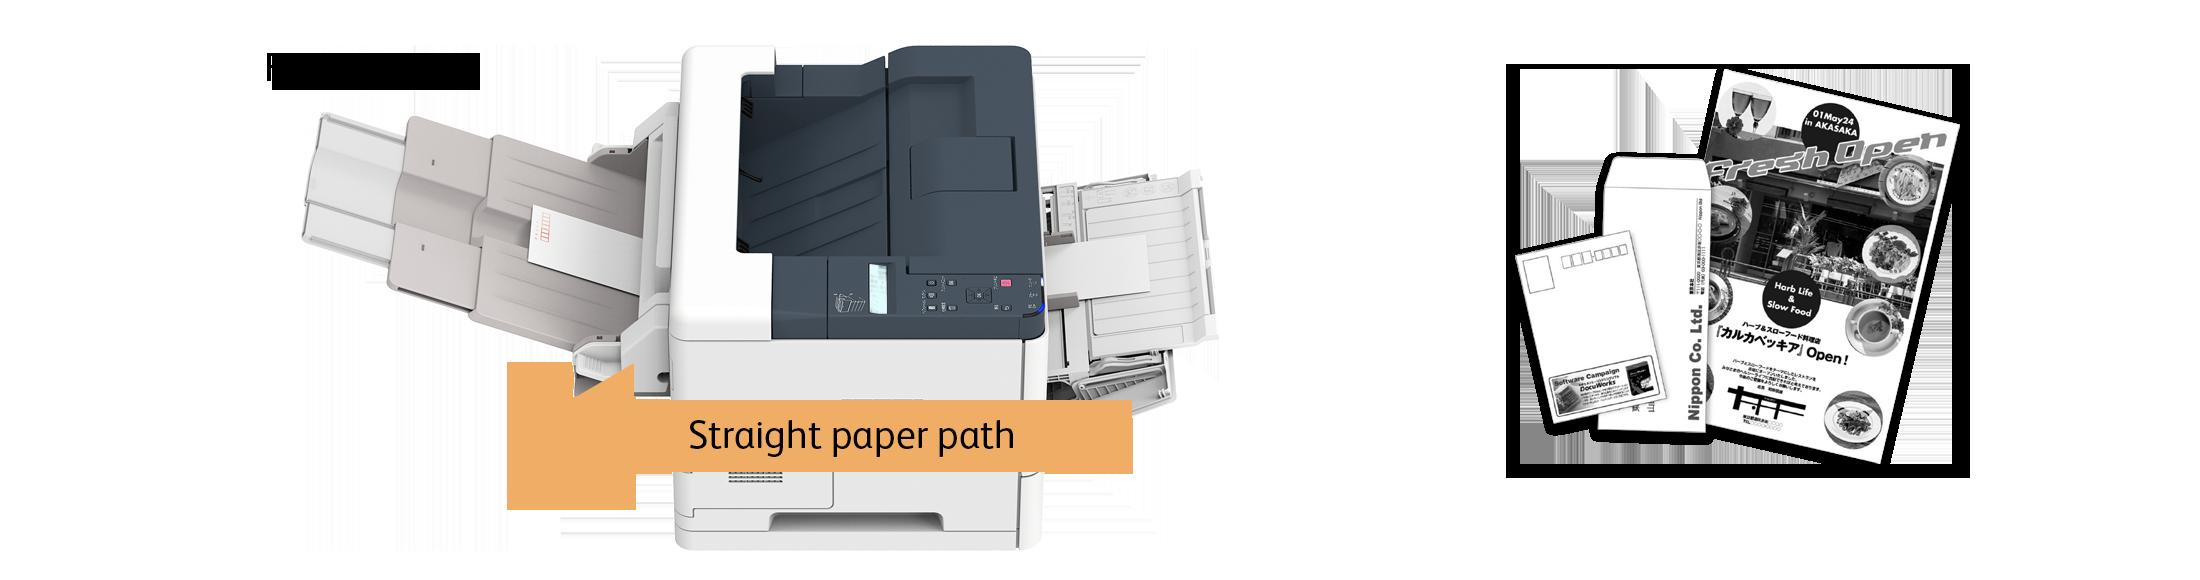 Straight paper path